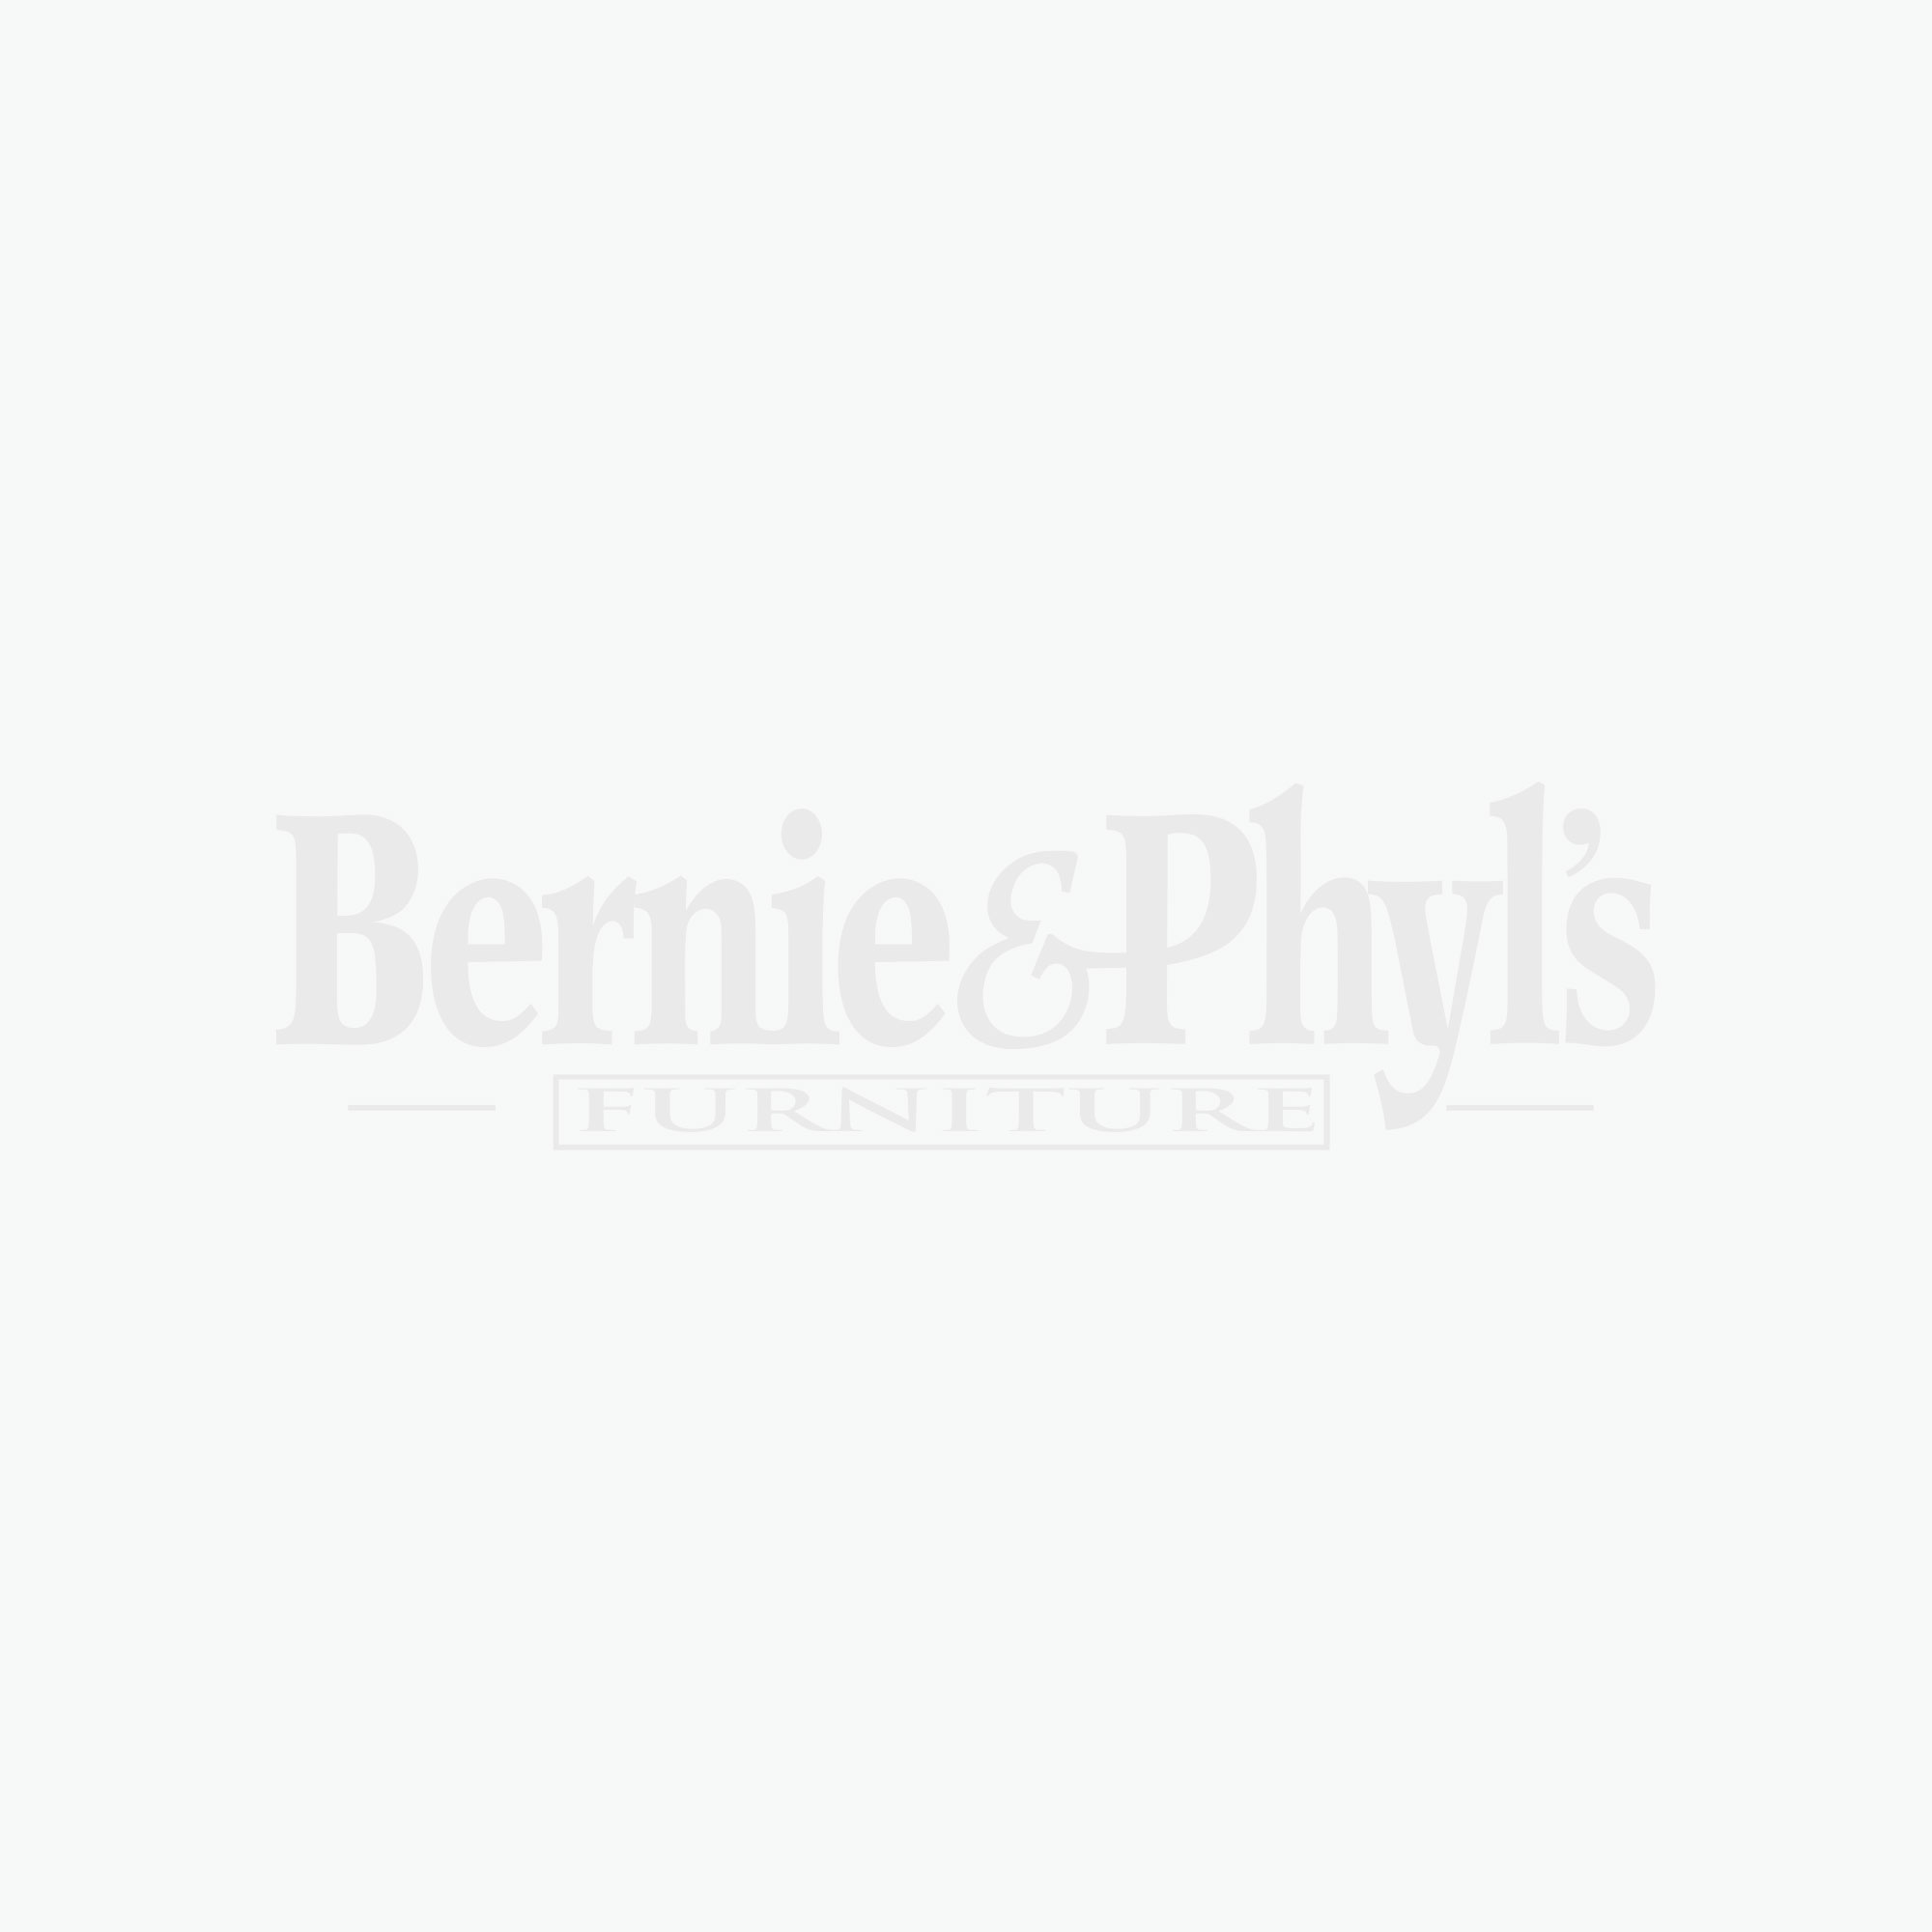 Ralene Upholstered Barstool - Medium Brown - (Set of 2) - D594-124 by Ashley Furniture Signature Design